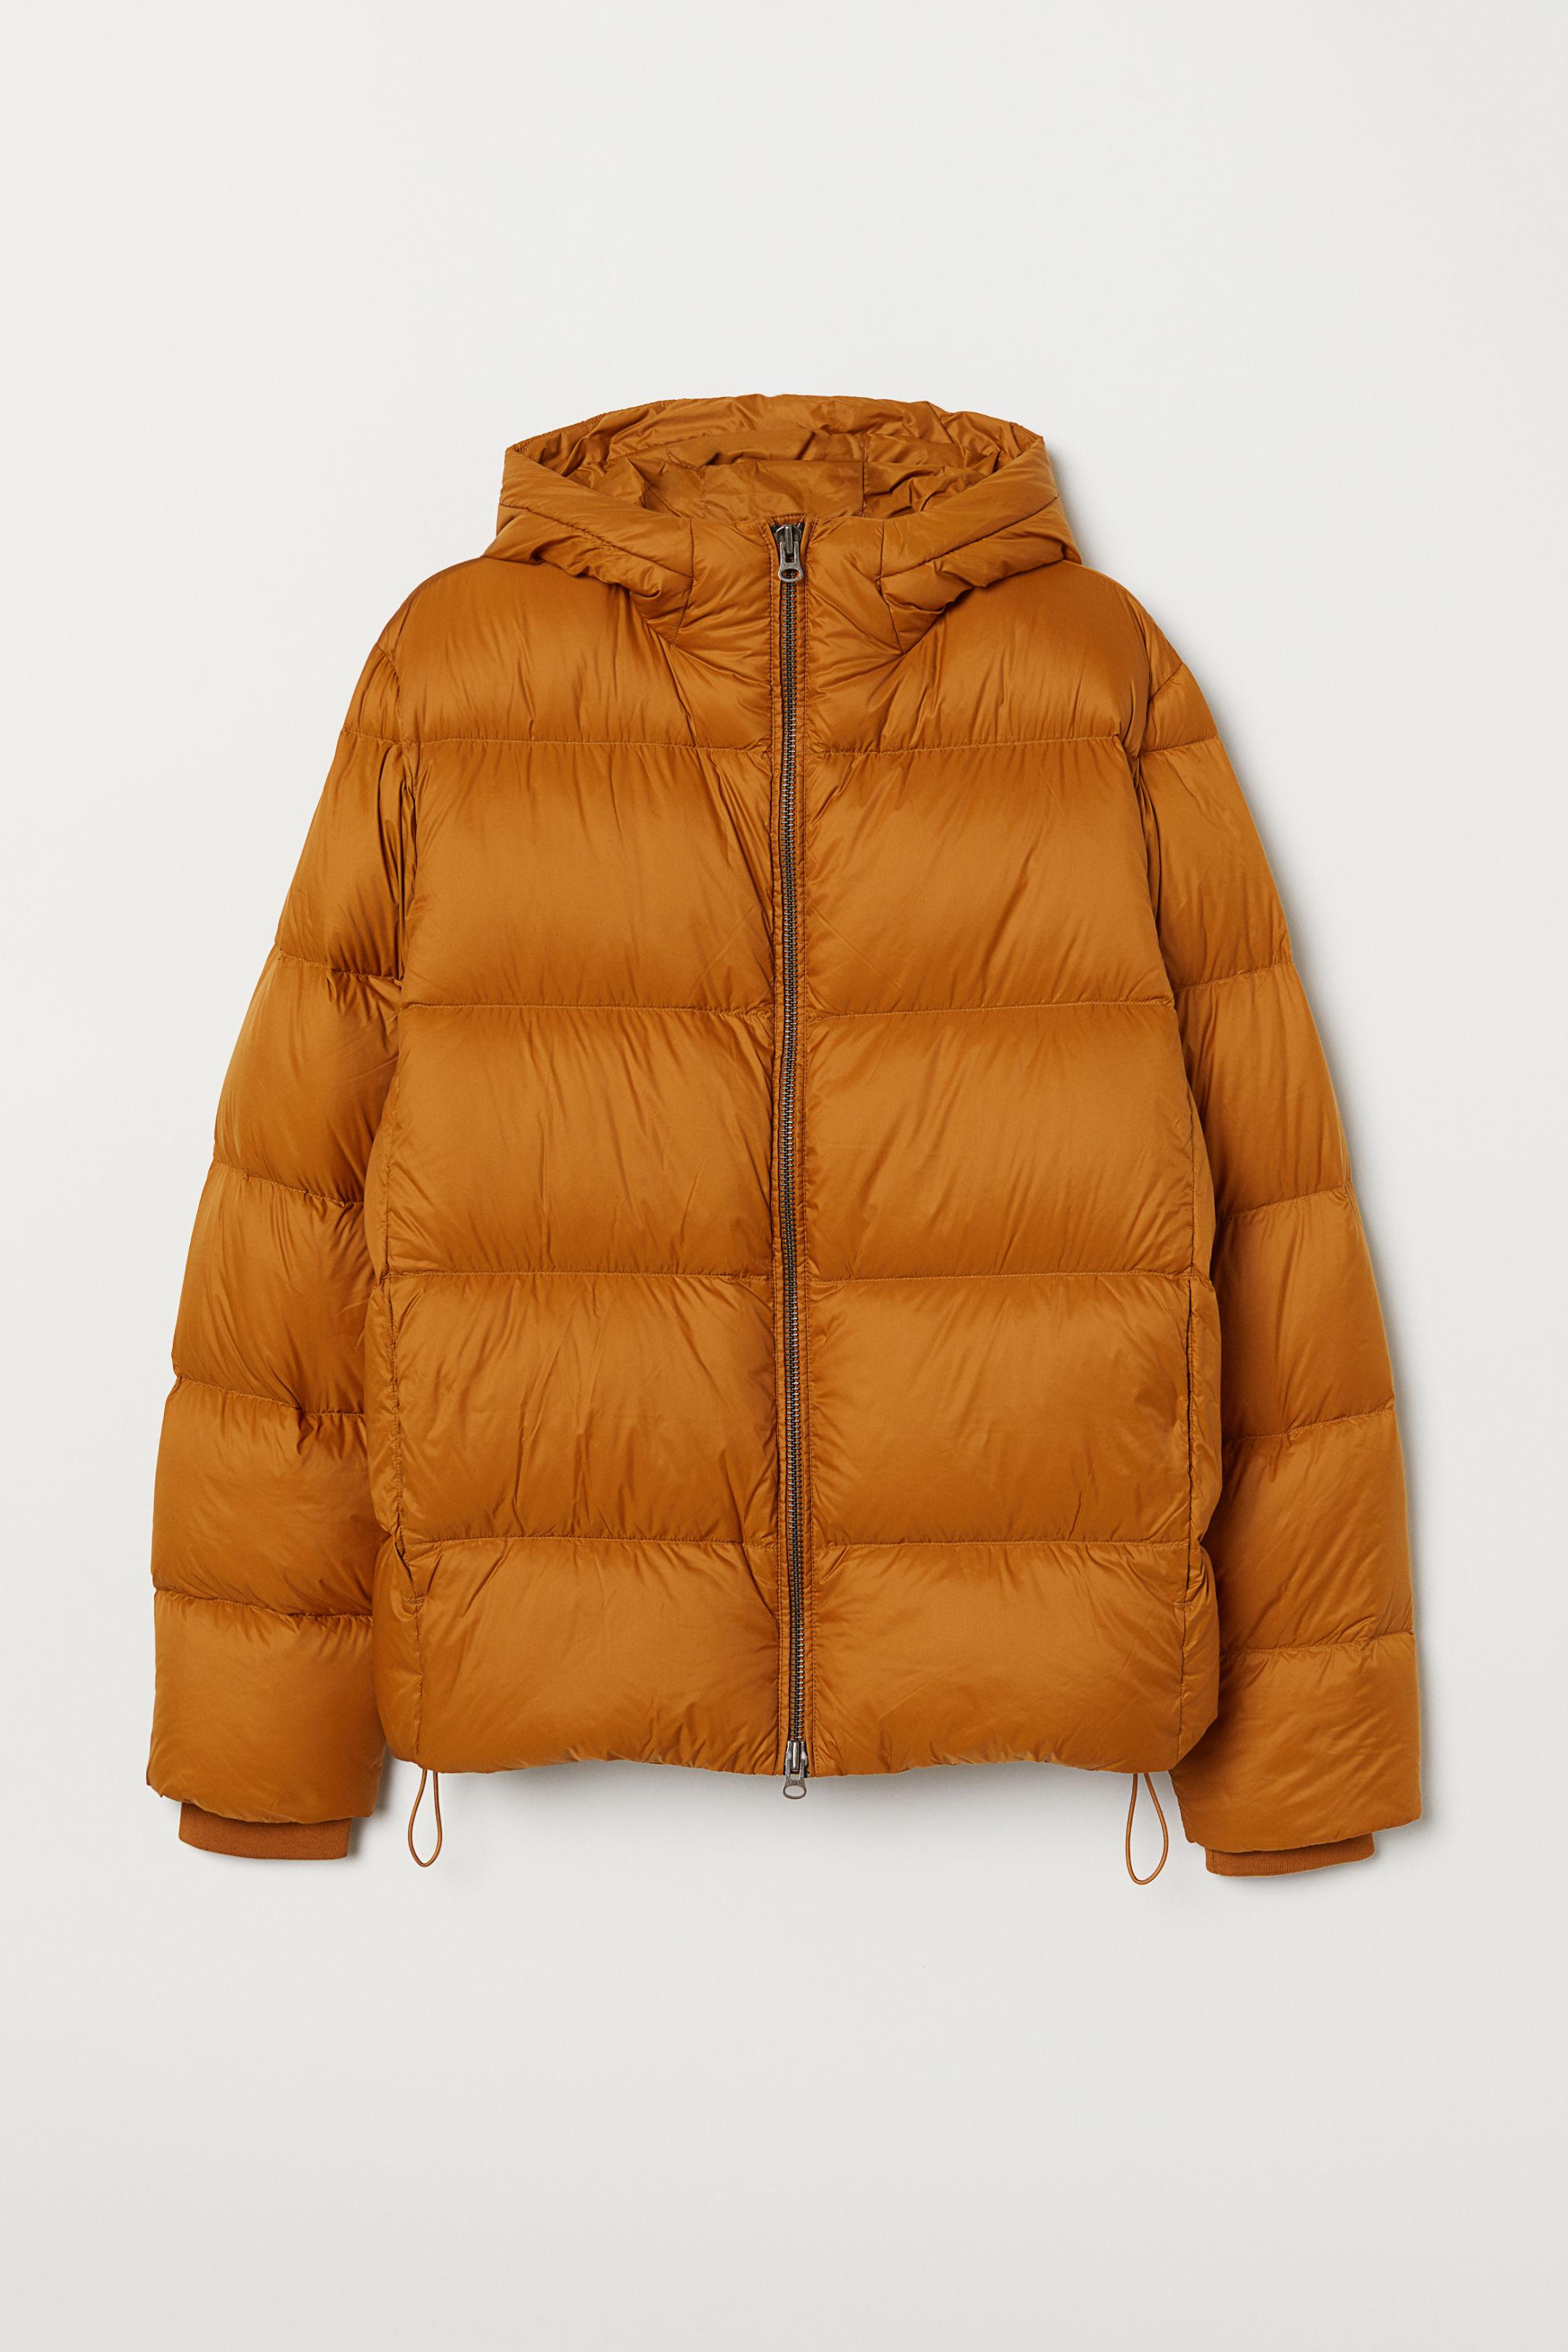 252e99c40 The Best Affordable Men's Down Jackets Under £150 | VanityForbes